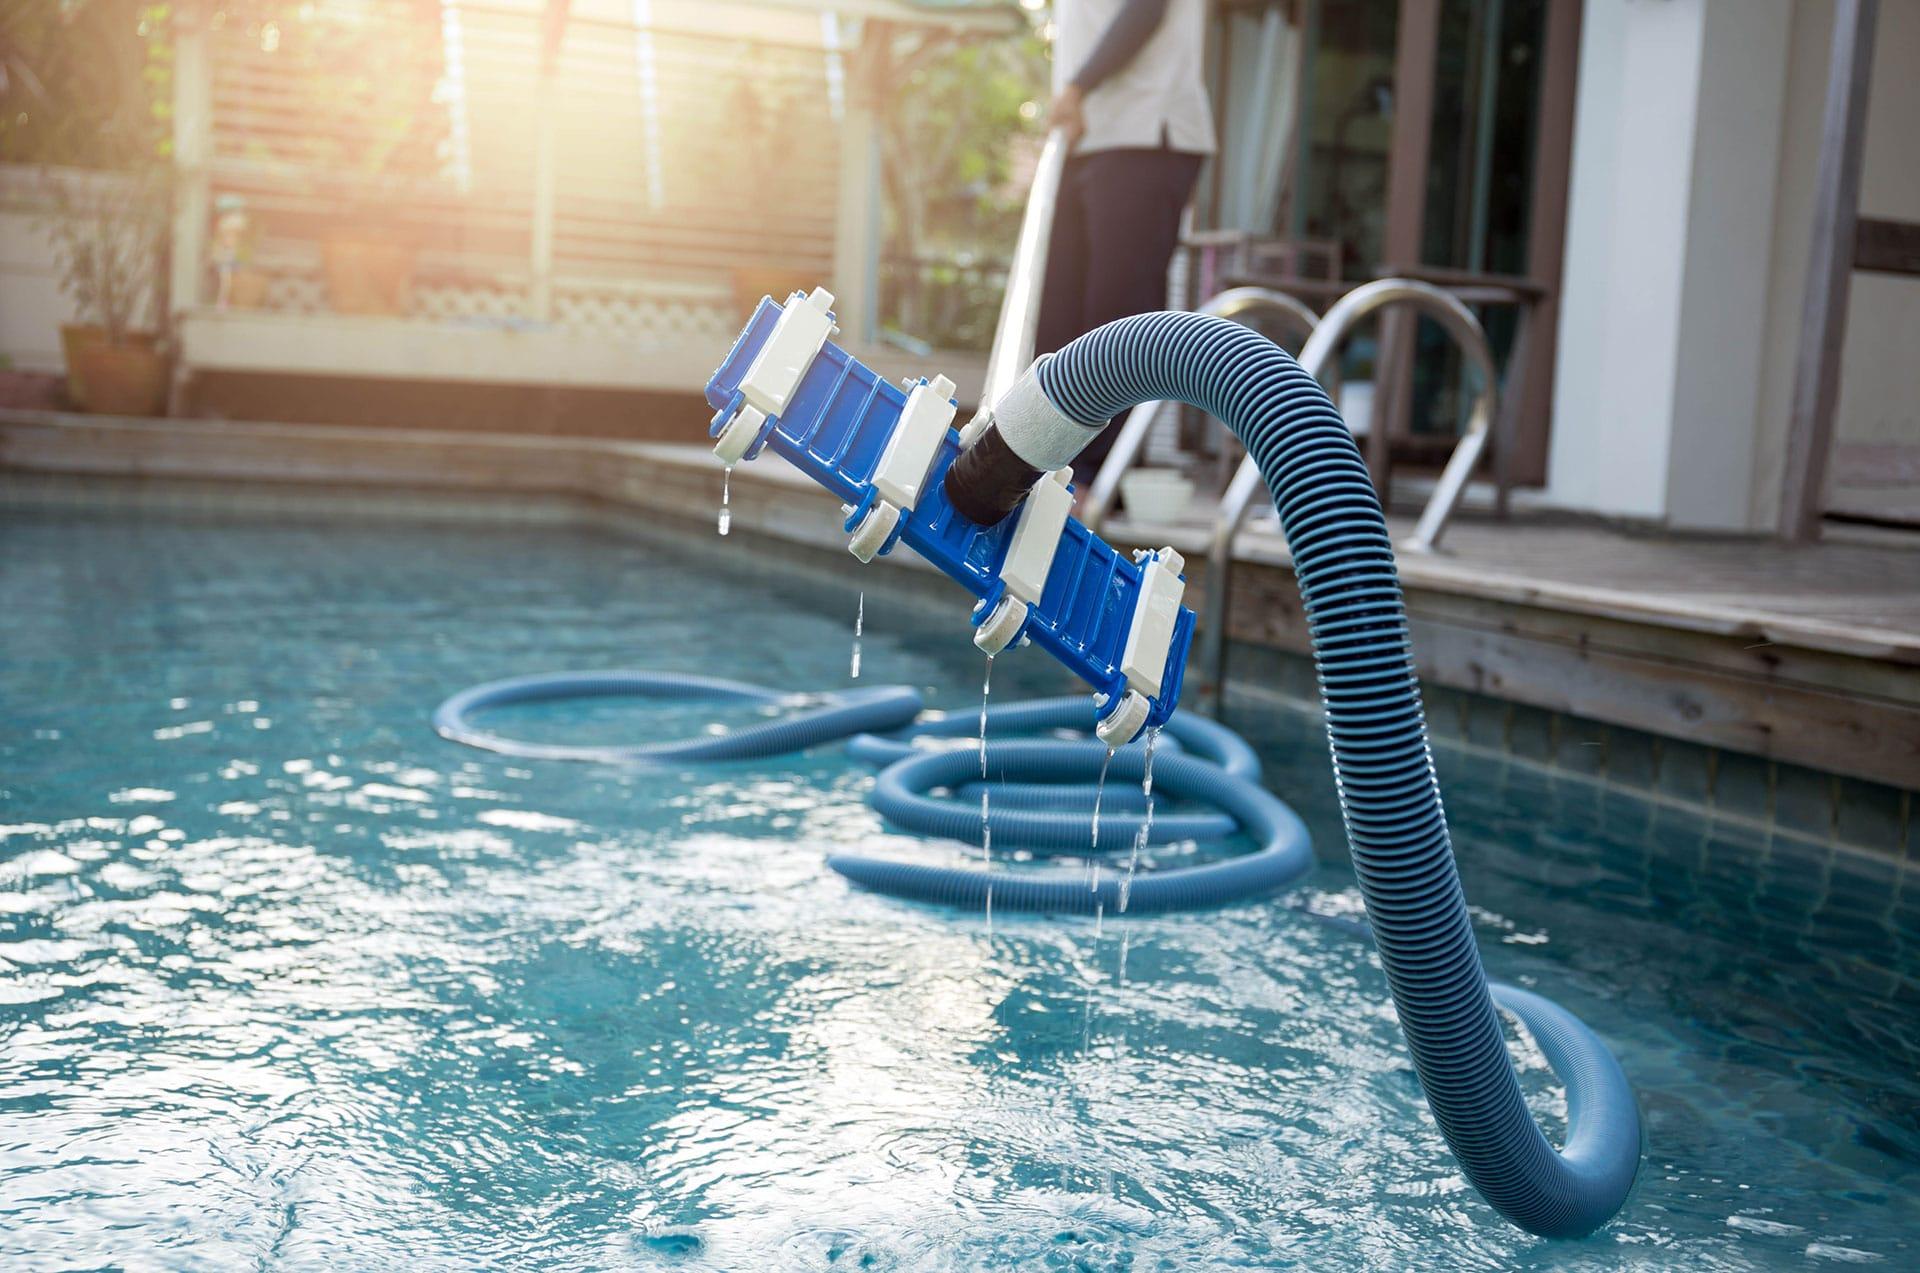 Quick tips for swimming pool maintenance - Splash Pools Inc.